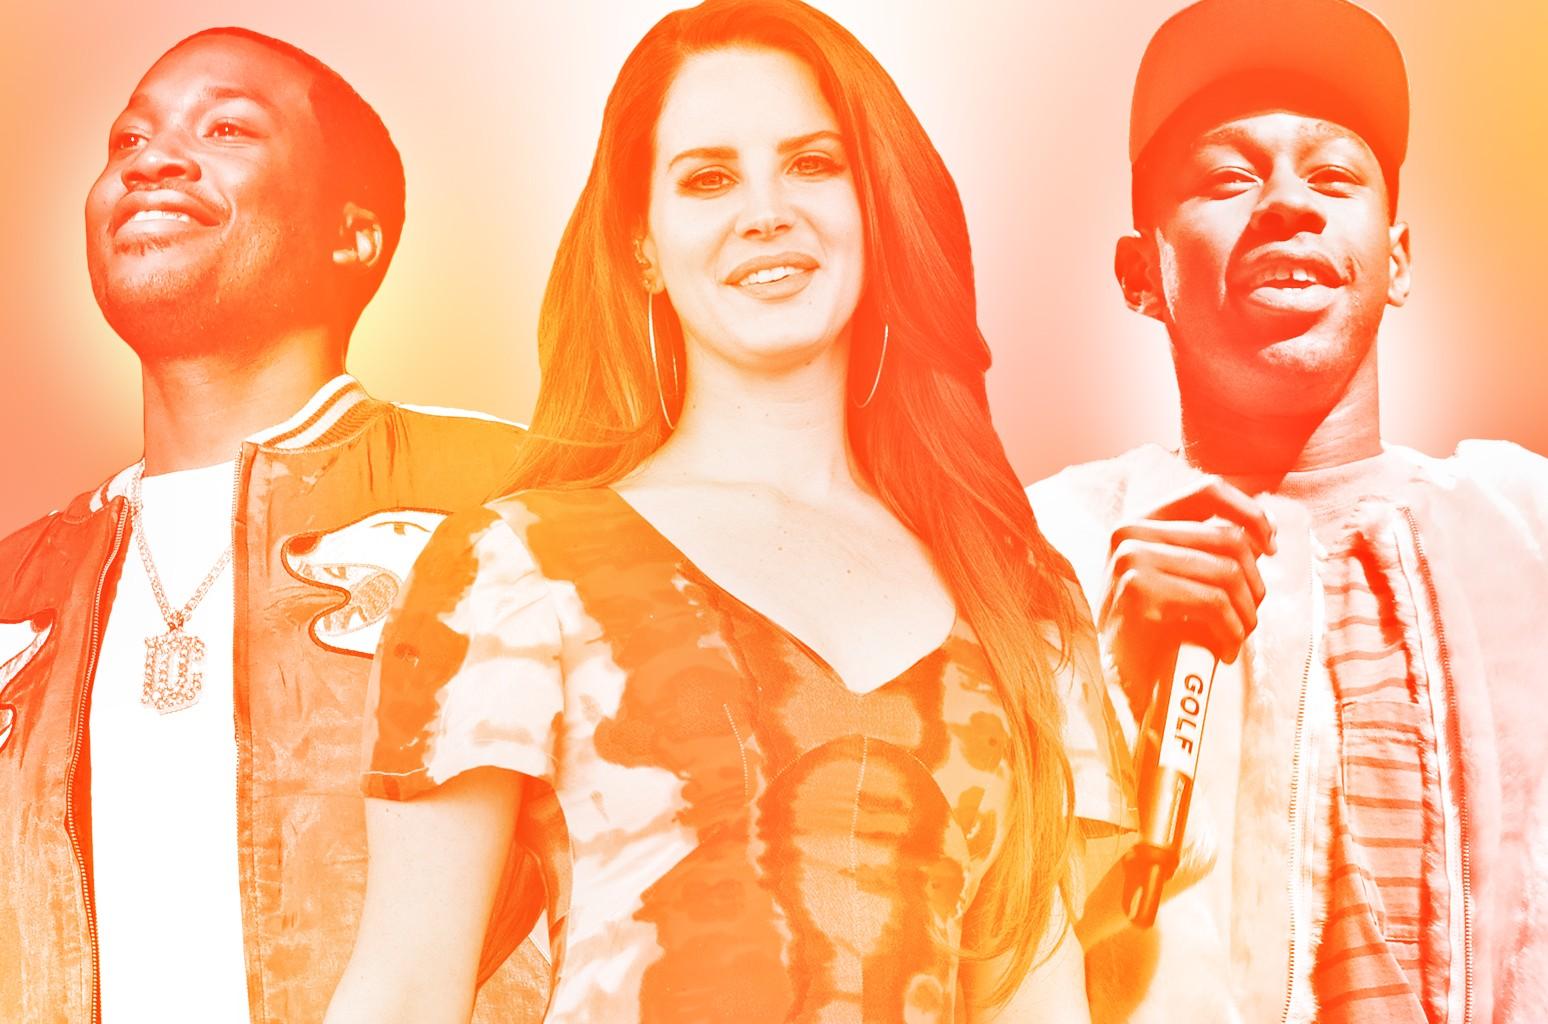 Meek Mill, Lana Del Rey & Tyler, The Creator